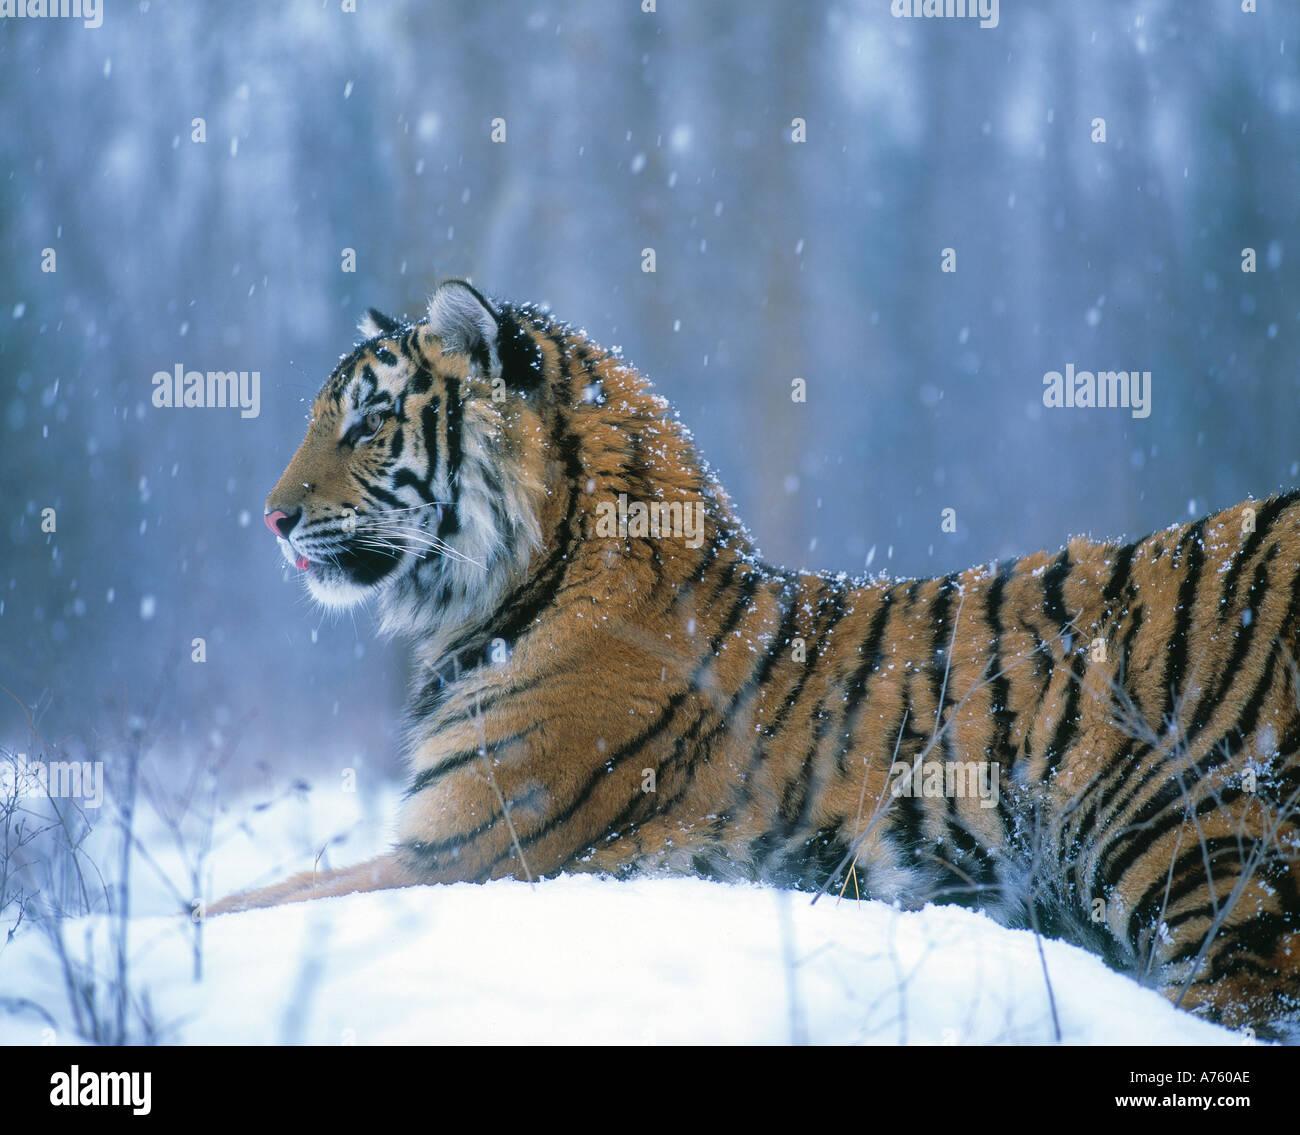 Siberian tiger in winter - Stock Image